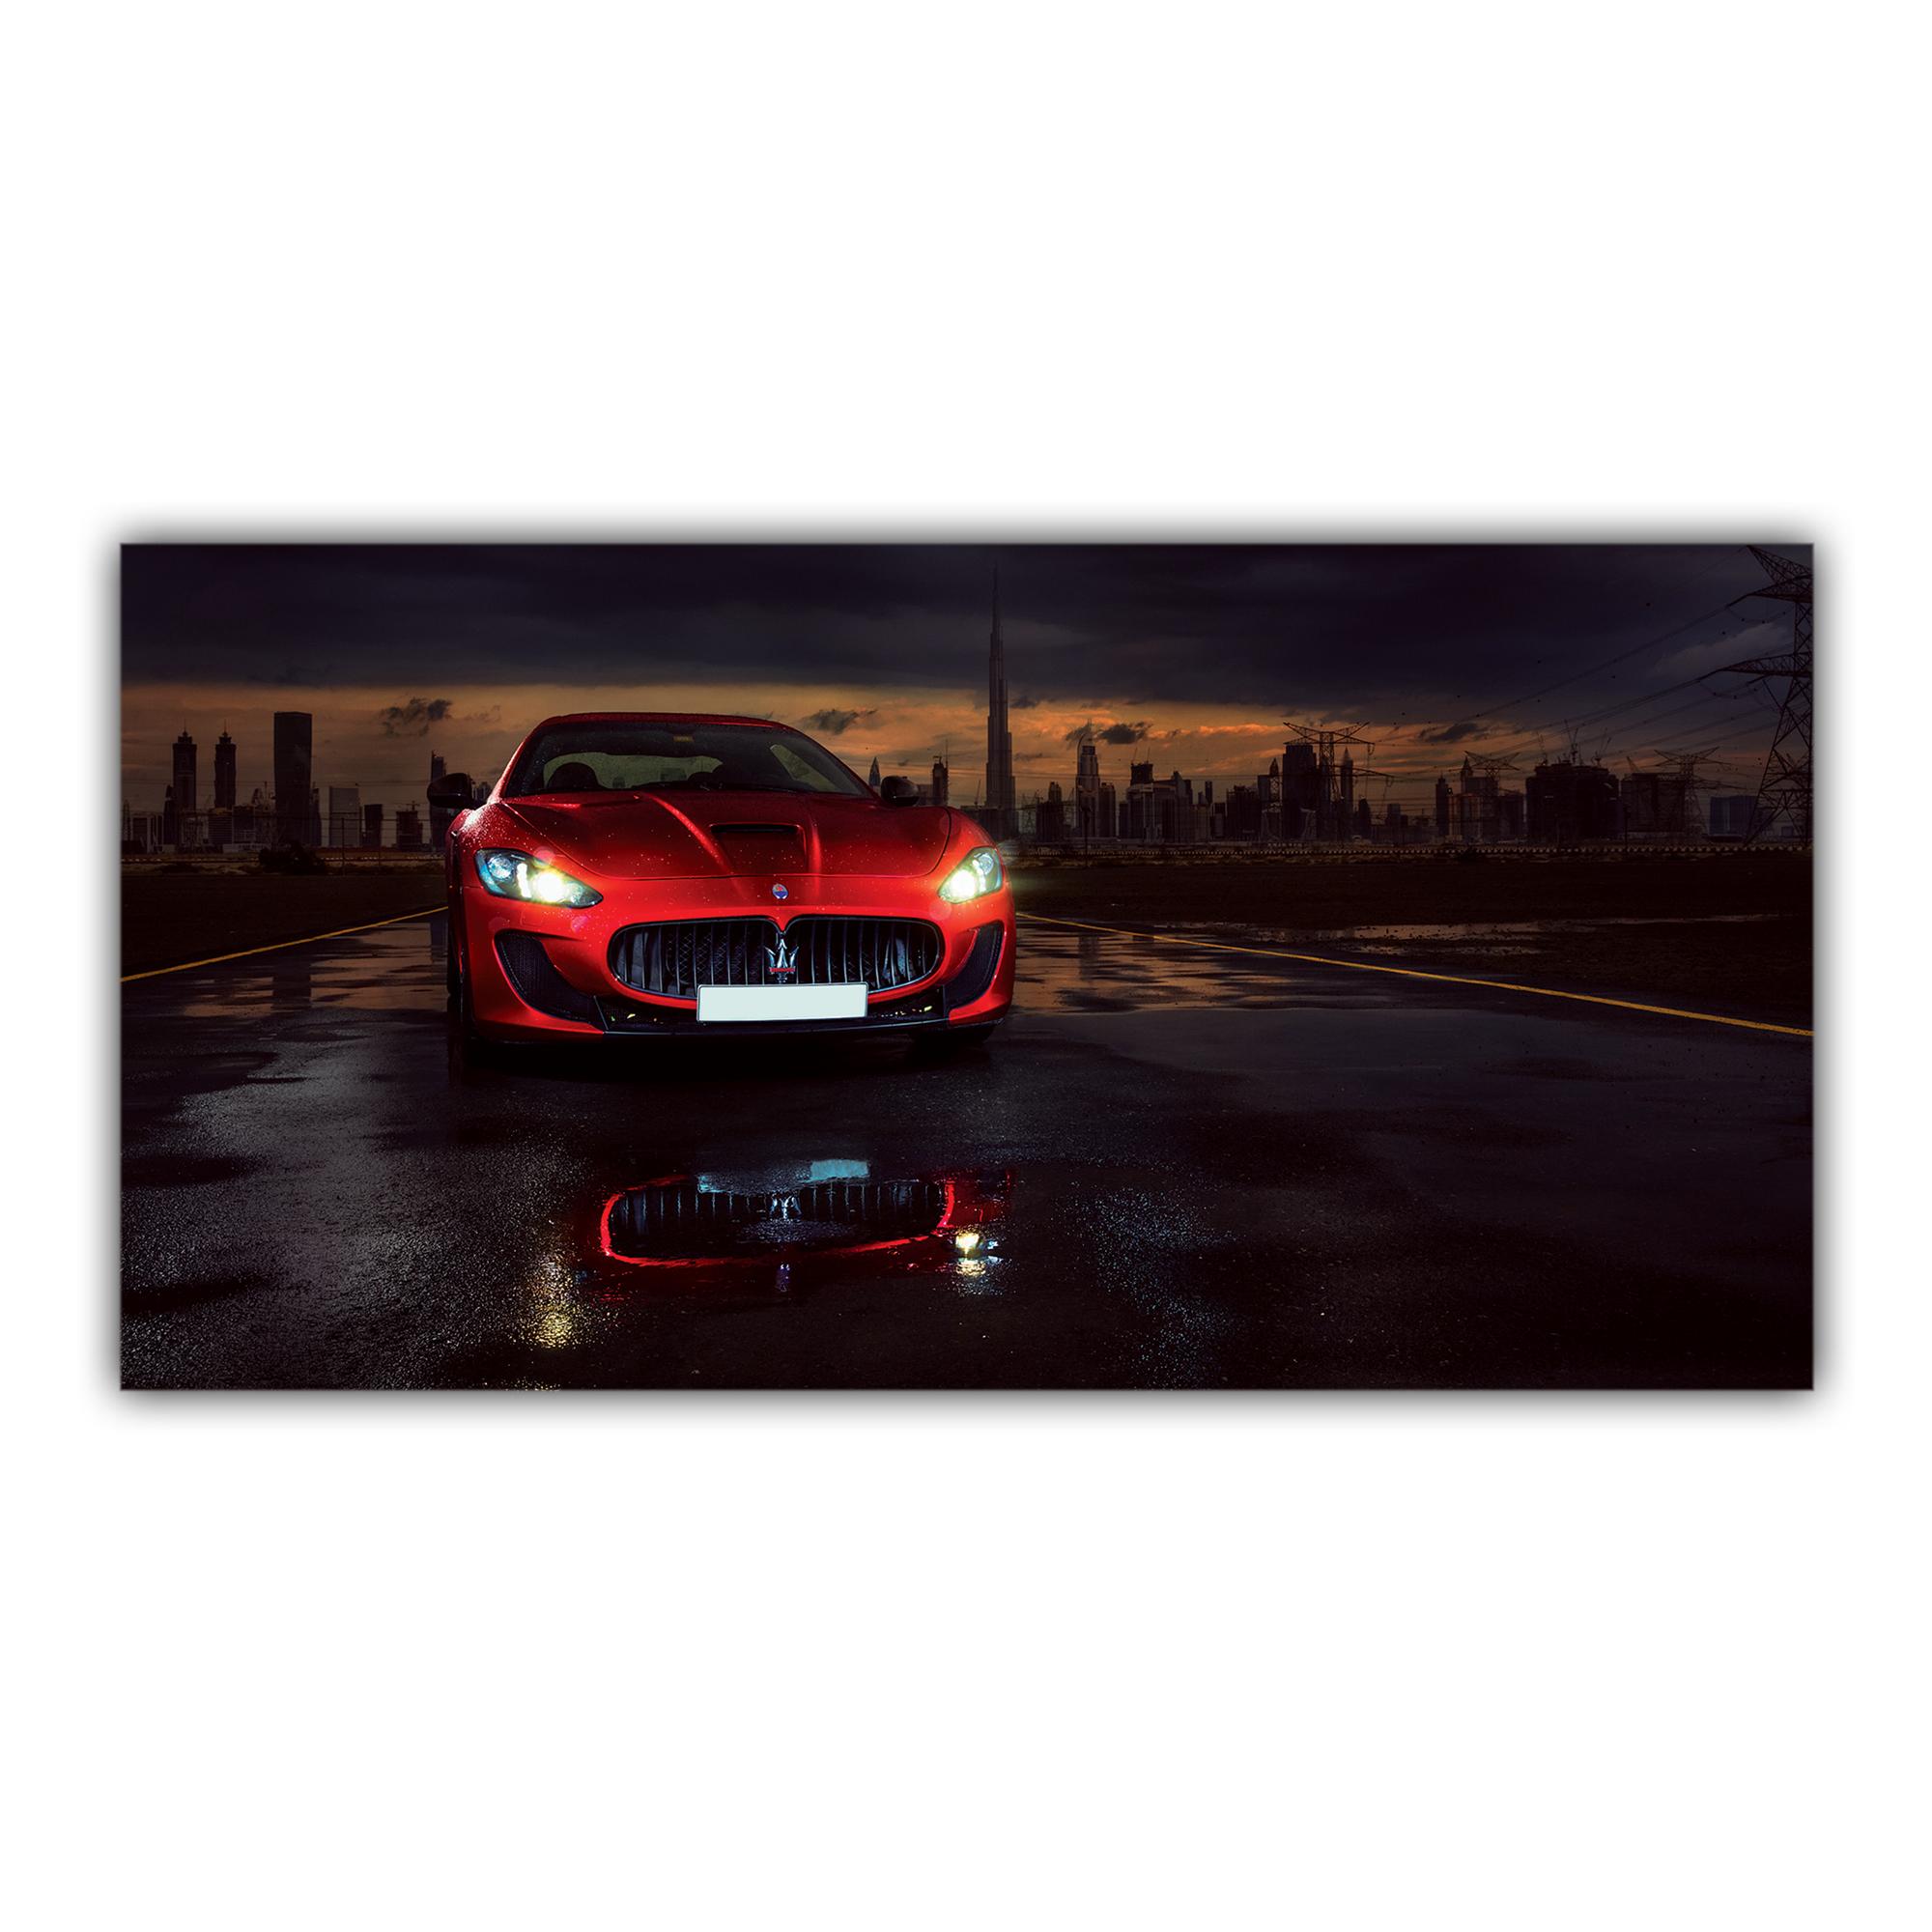 Maserati GranTurismo Sport rouge v8